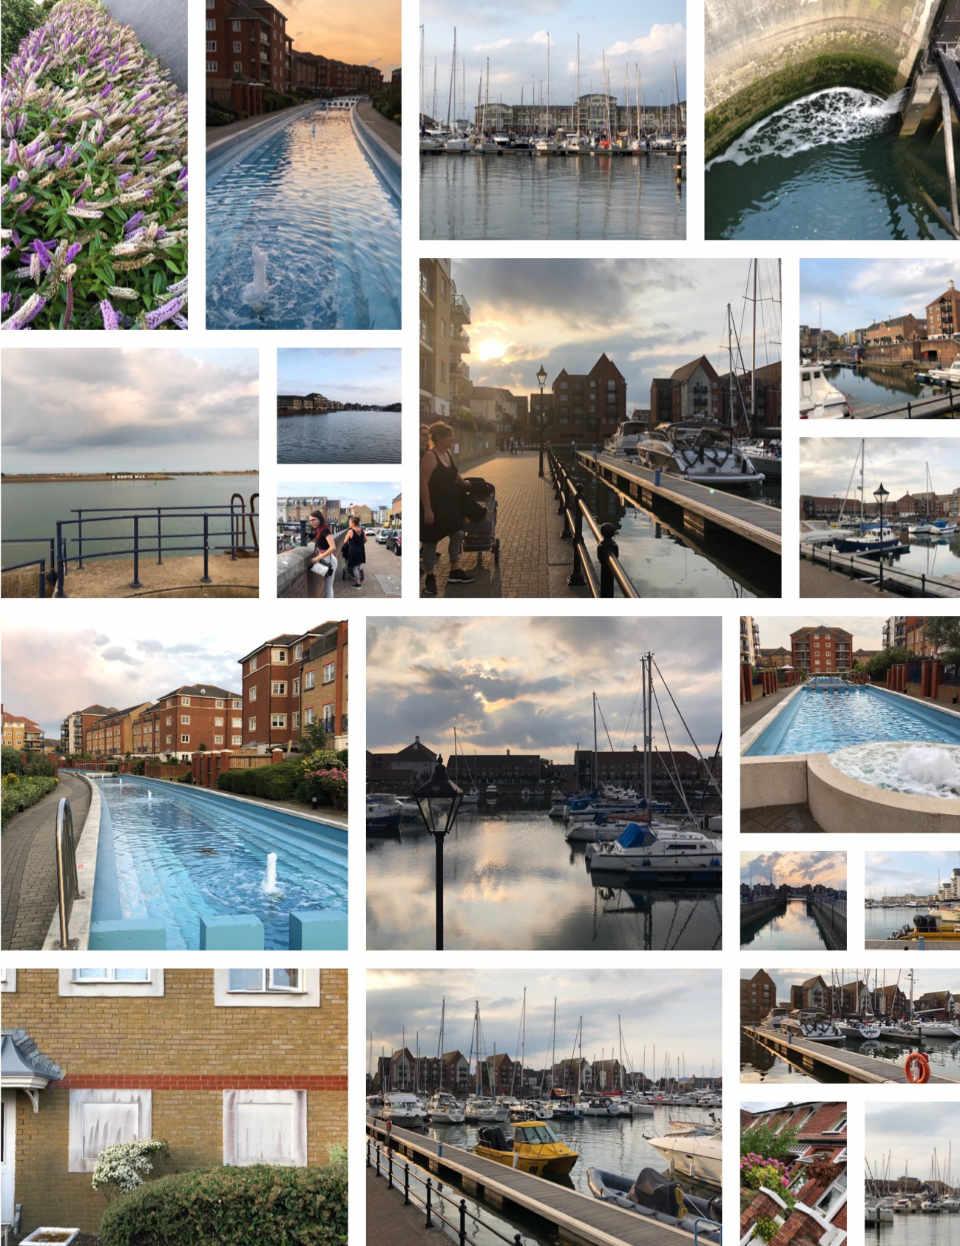 Eastbourne, Pevensey, East Dean, Urlaub, England, Land erkunden, Reisebericht